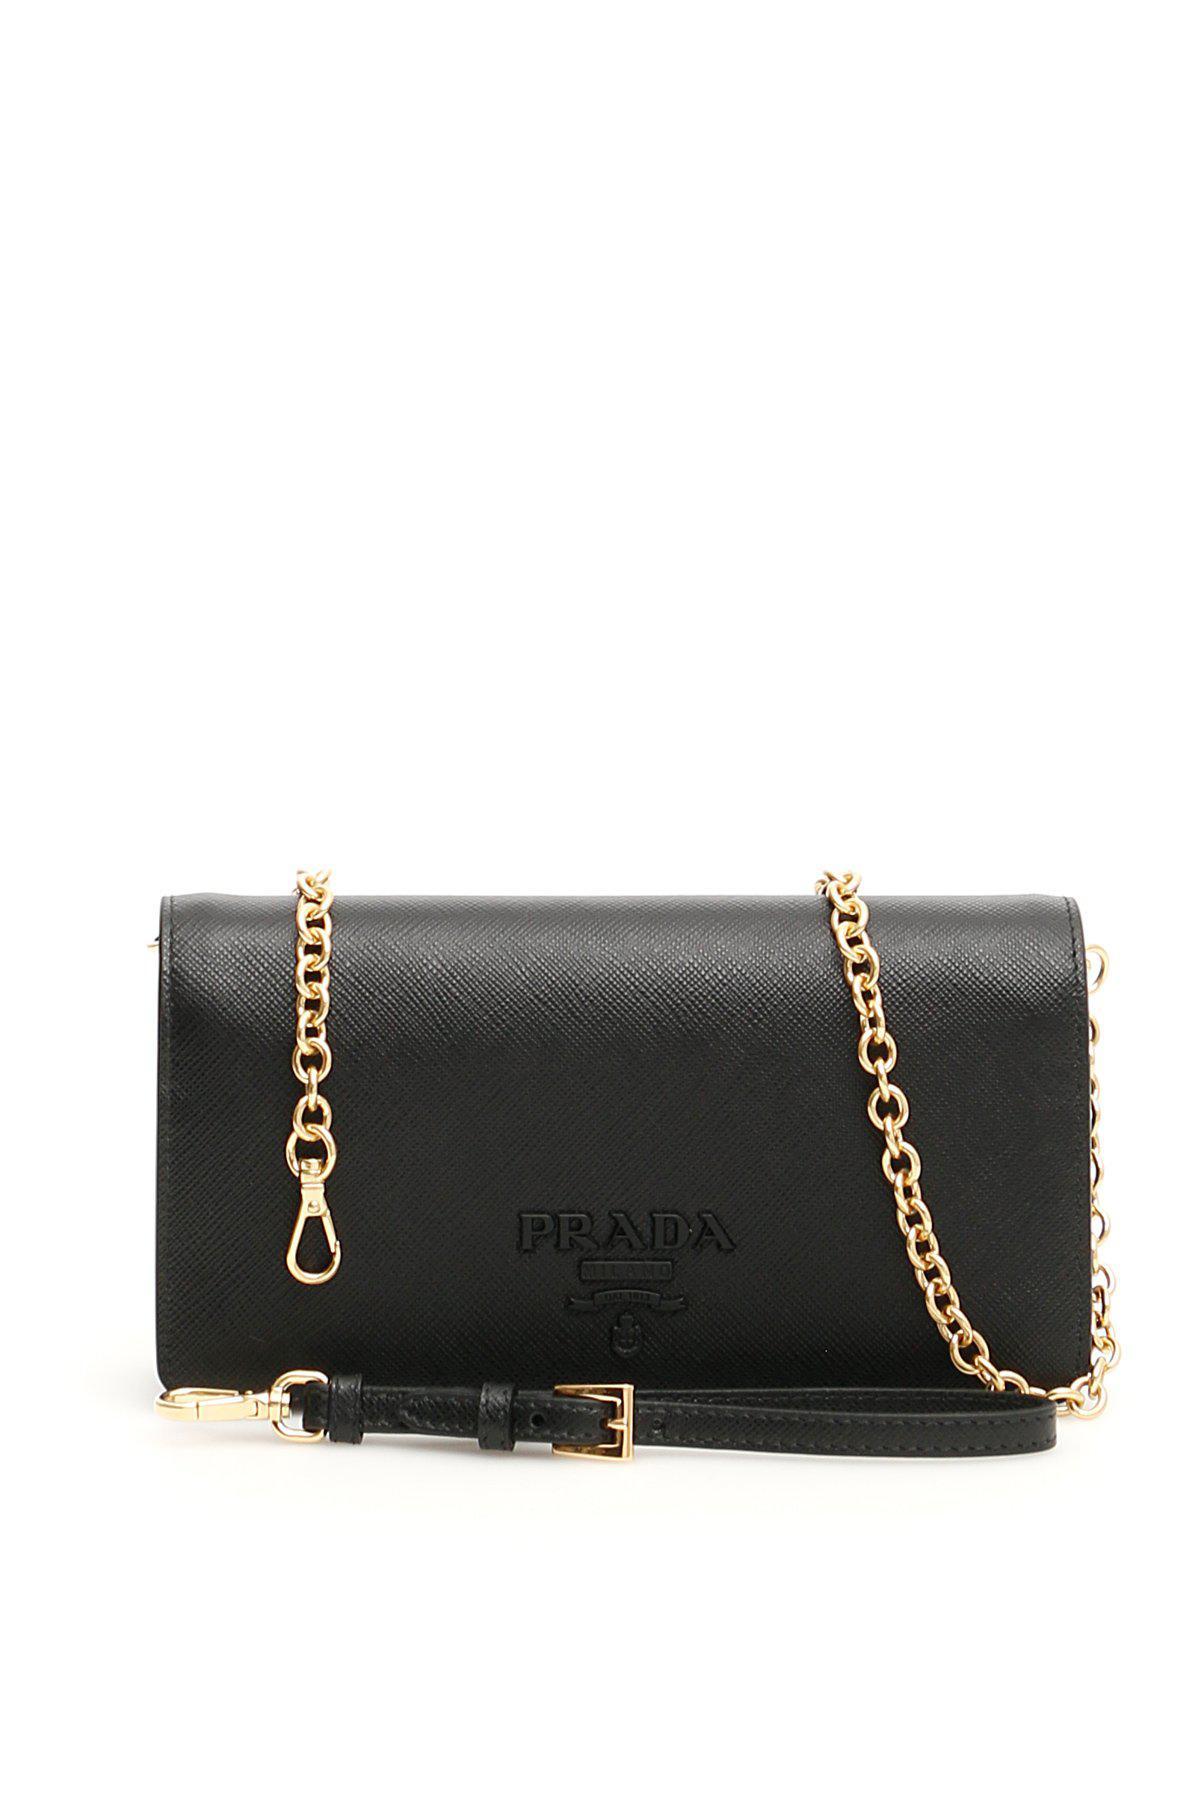 Prada Monochrome Mini Bag in Black - Lyst 38356eb6d2c21